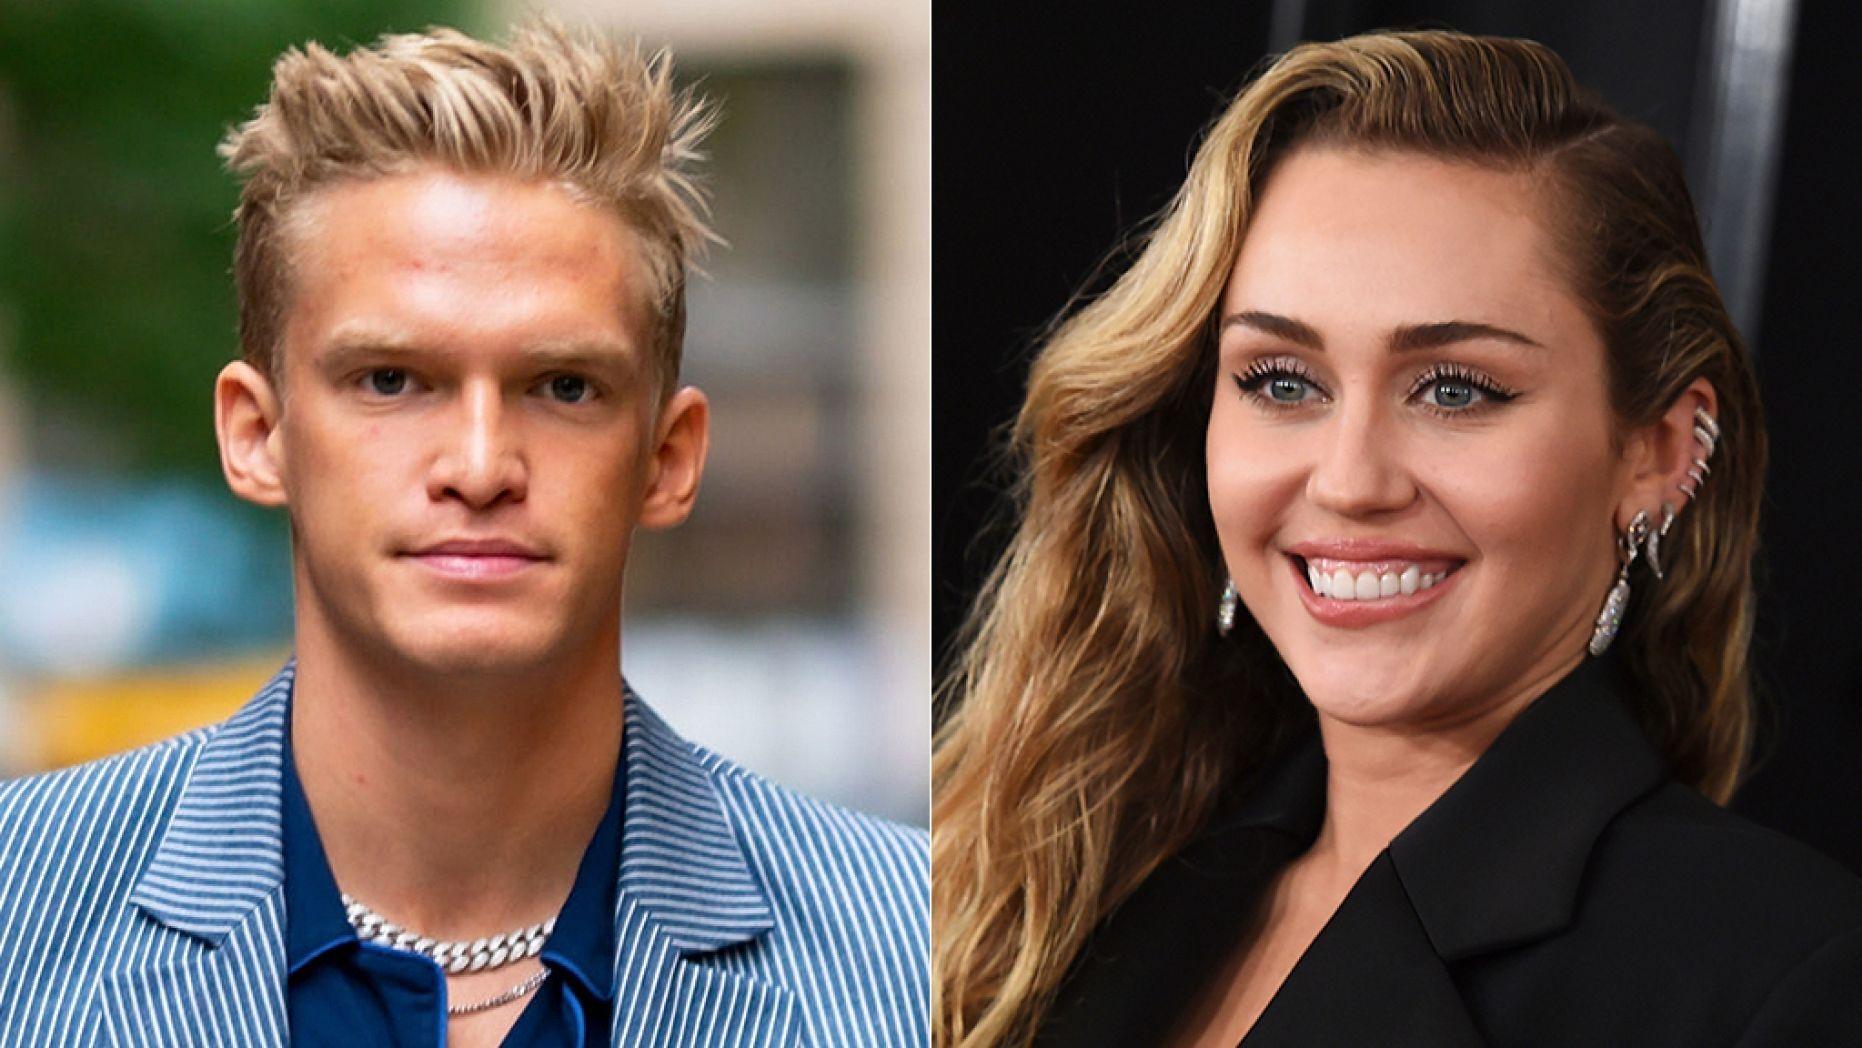 Miley Cyrus New Fling Cody Simpson Calls Her Baby In Flirty Selfie Miley Cyrus Boyfriend Miley Cyrus Cody Simpson